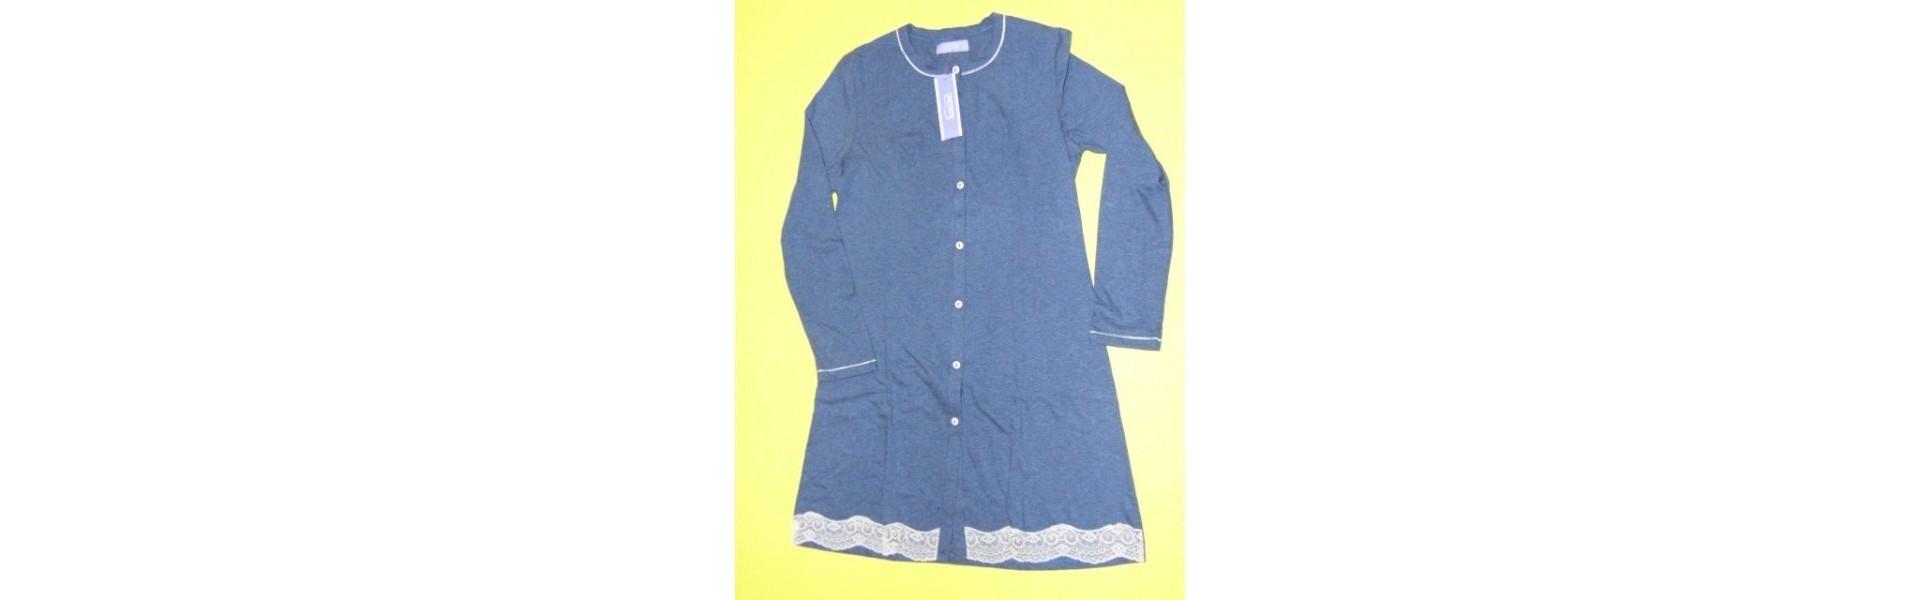 Camicie da notte cotone manica lunga